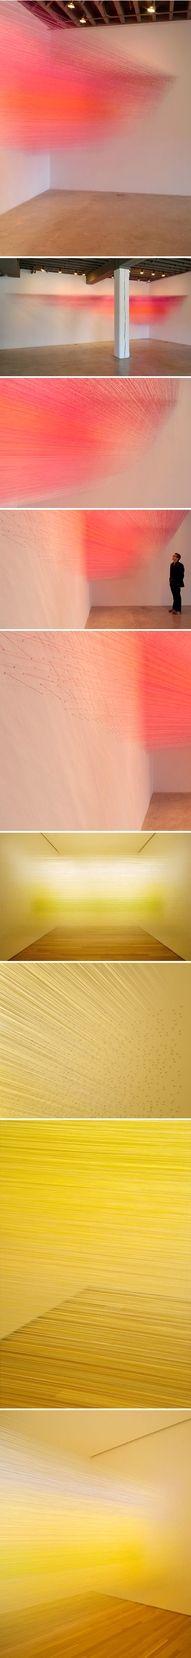 anne lindberg - thread installations